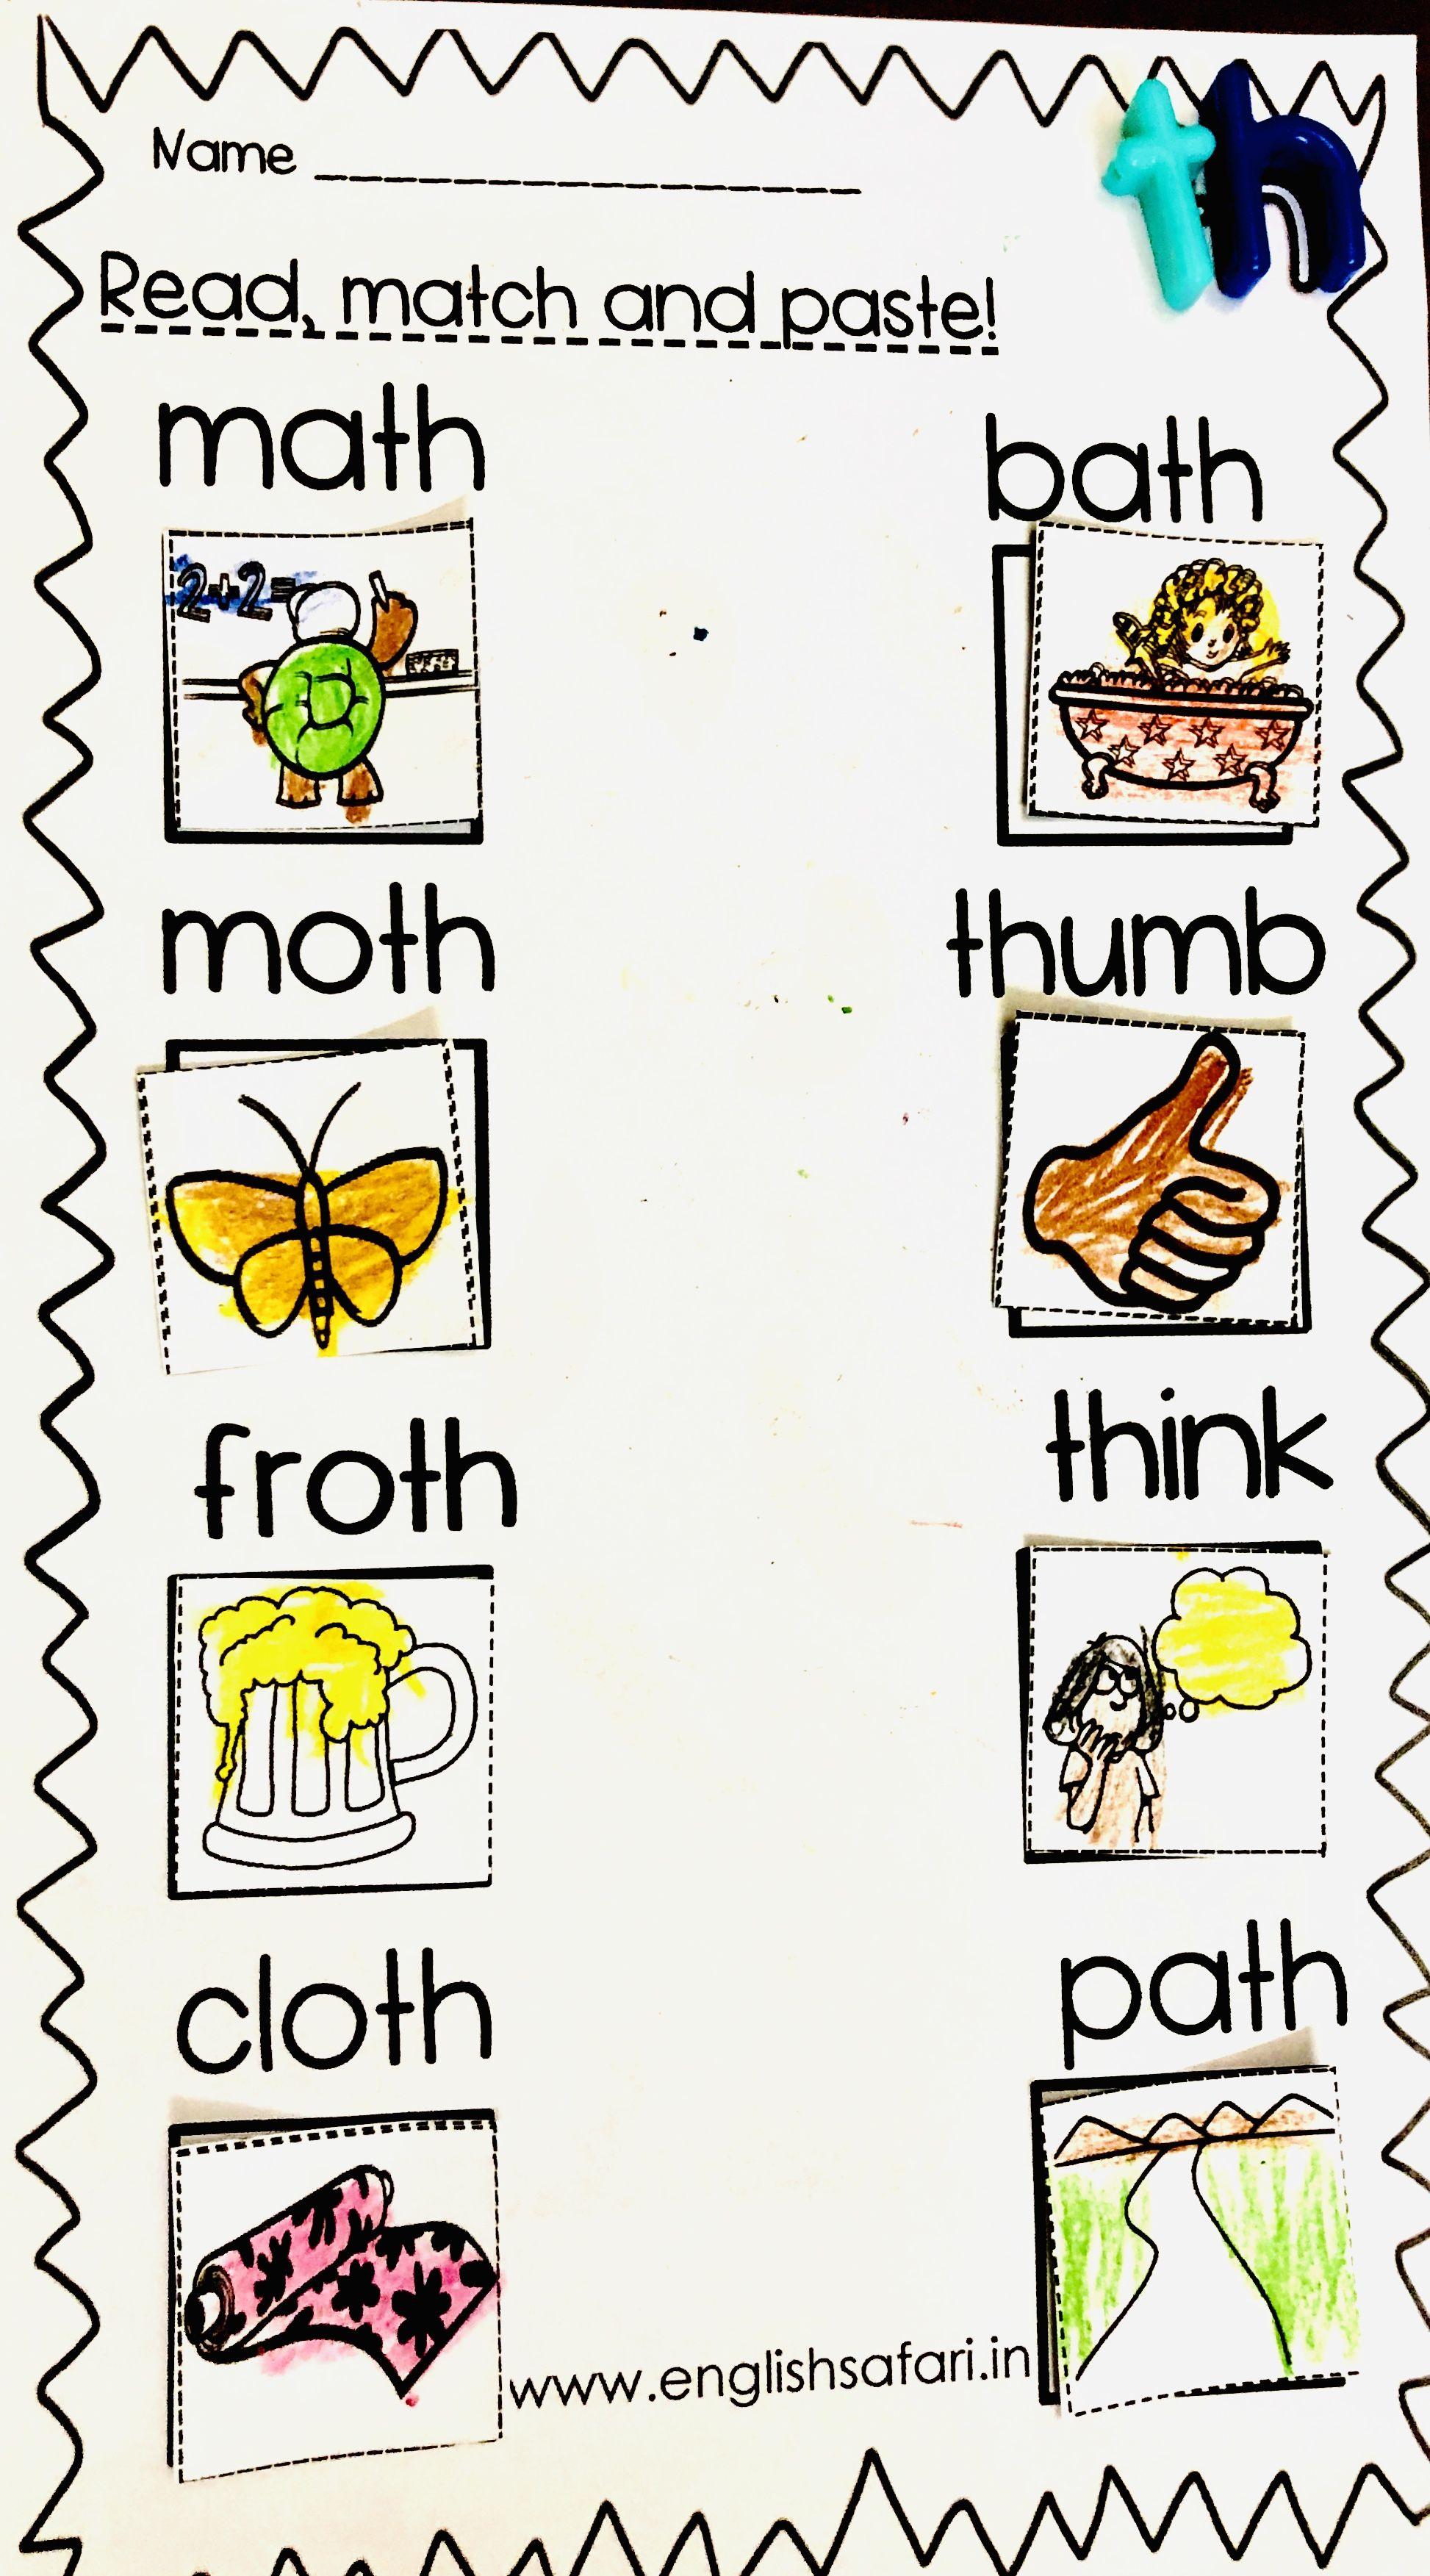 Th Sound Words Worksheets Free Englishsafari